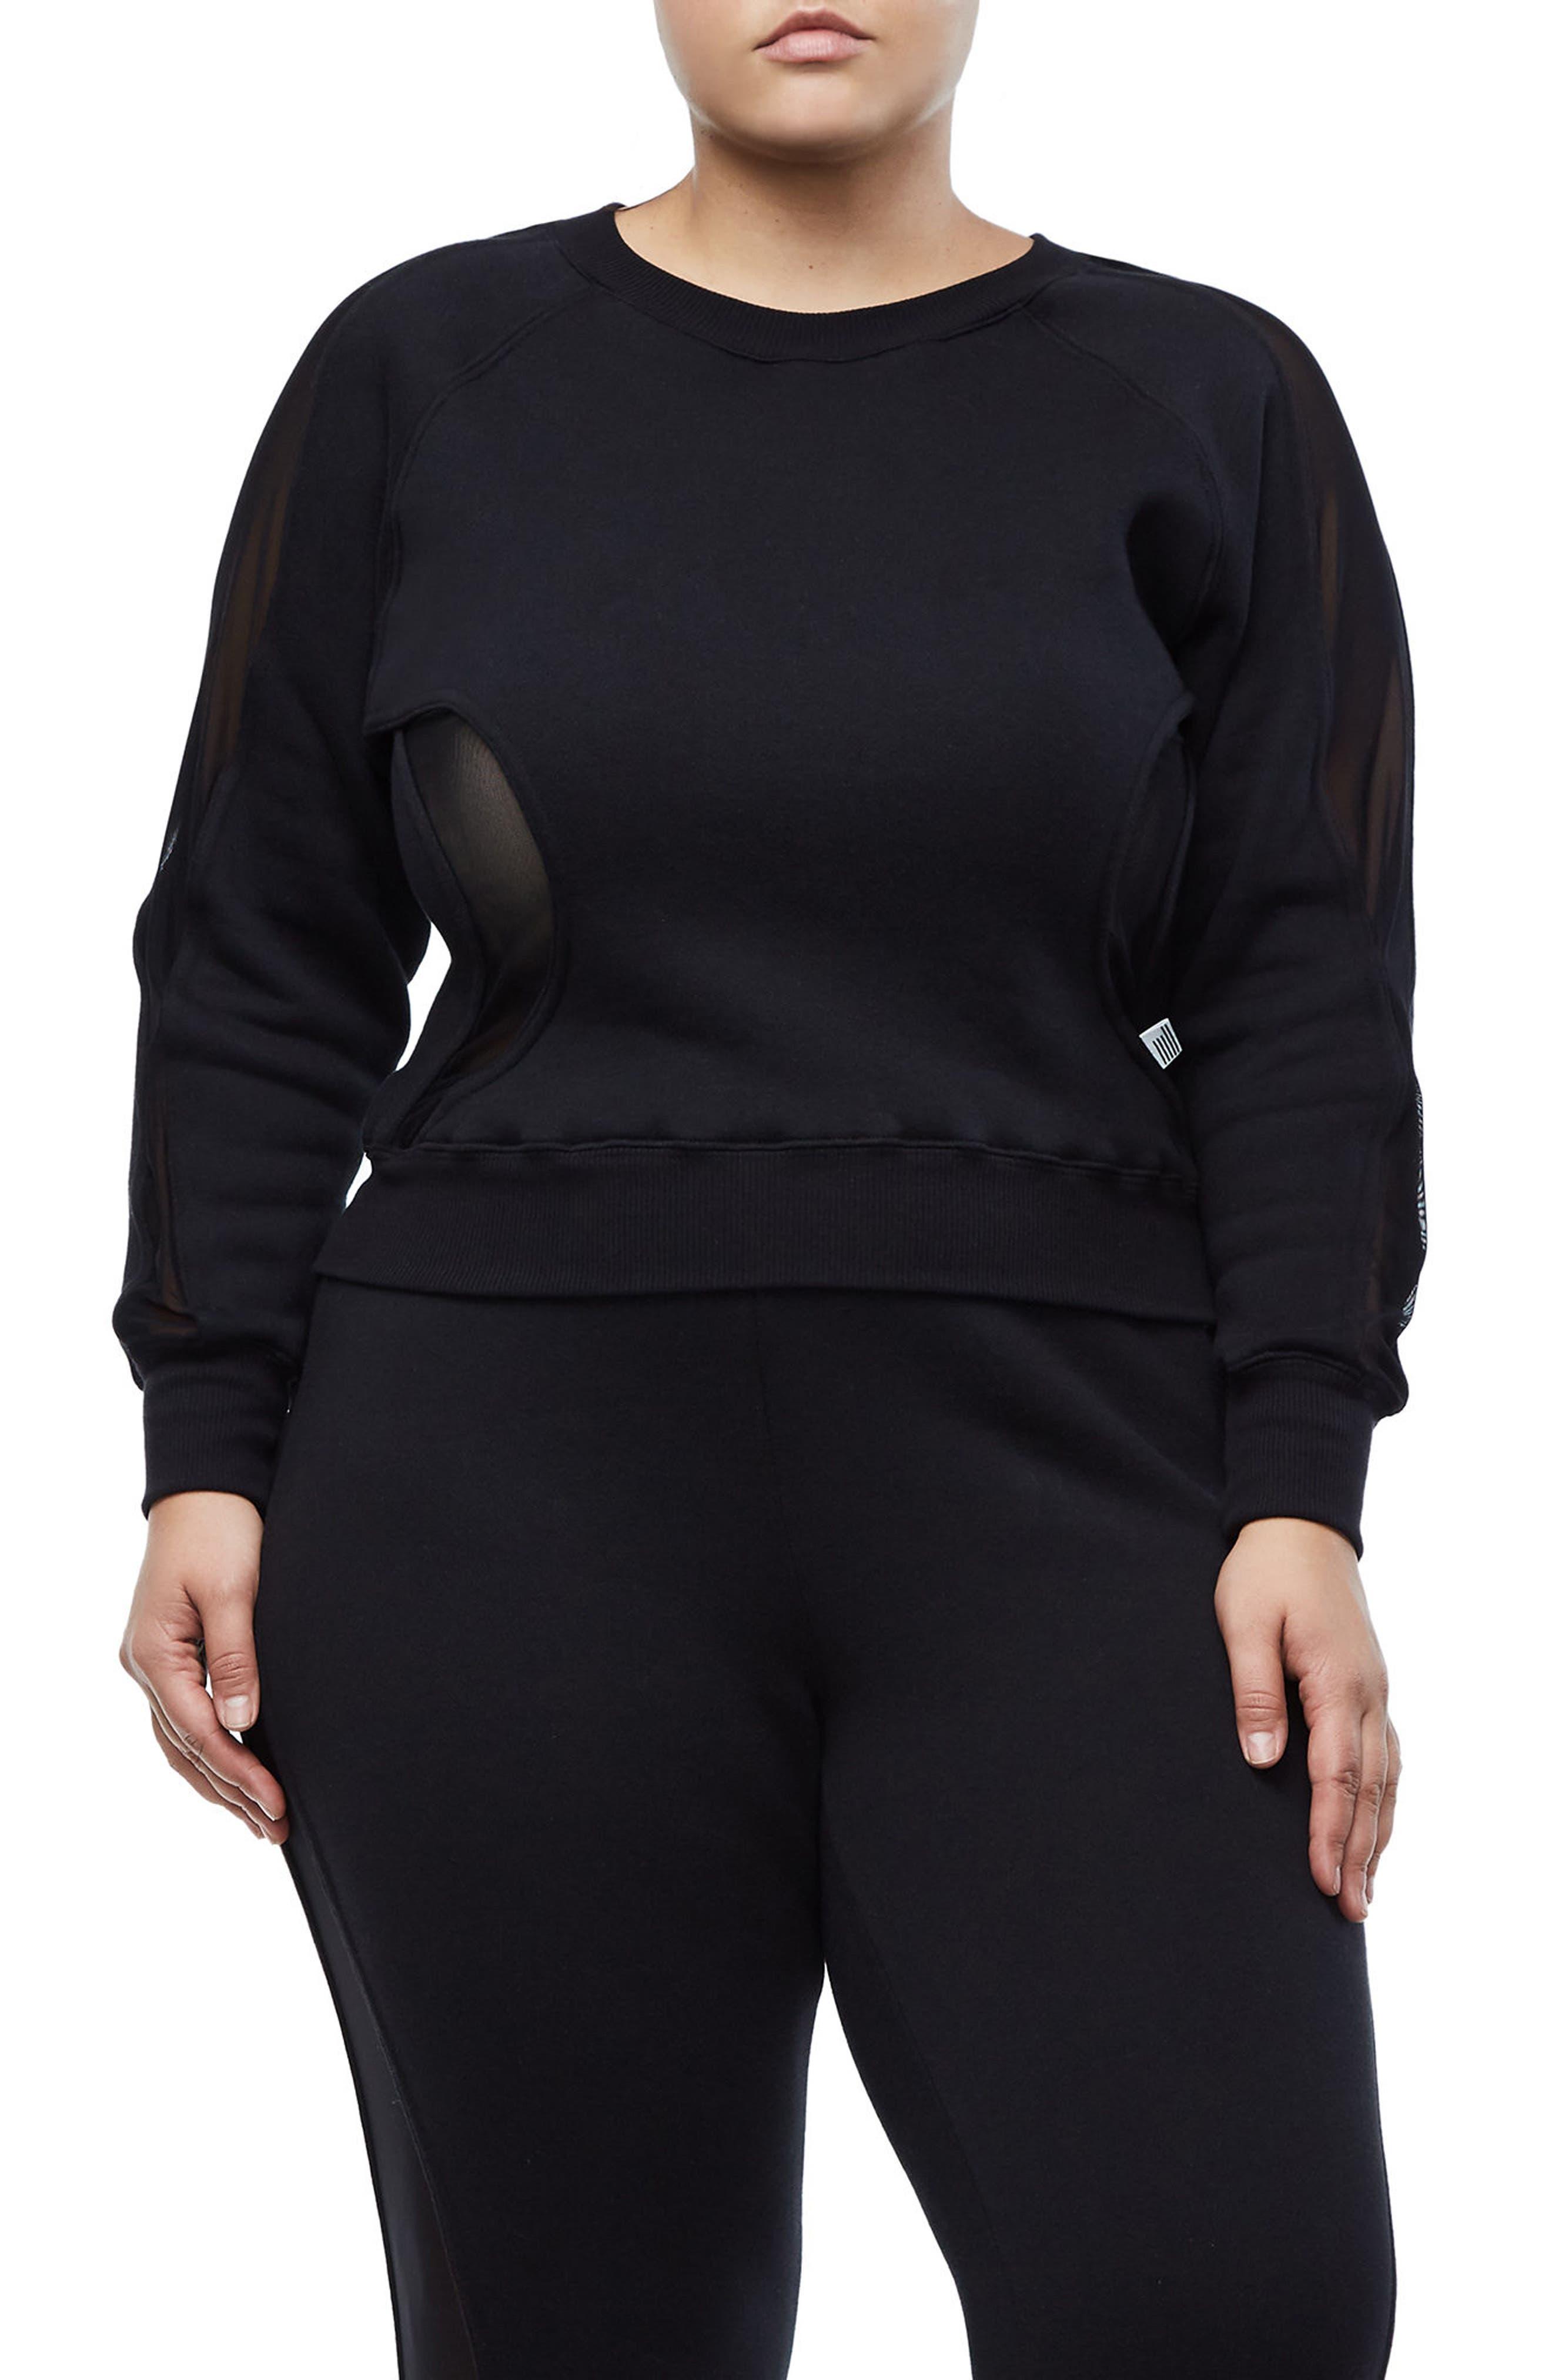 Good Sweats Mesh Inset Sweatshirt,                             Alternate thumbnail 2, color,                             Good Black